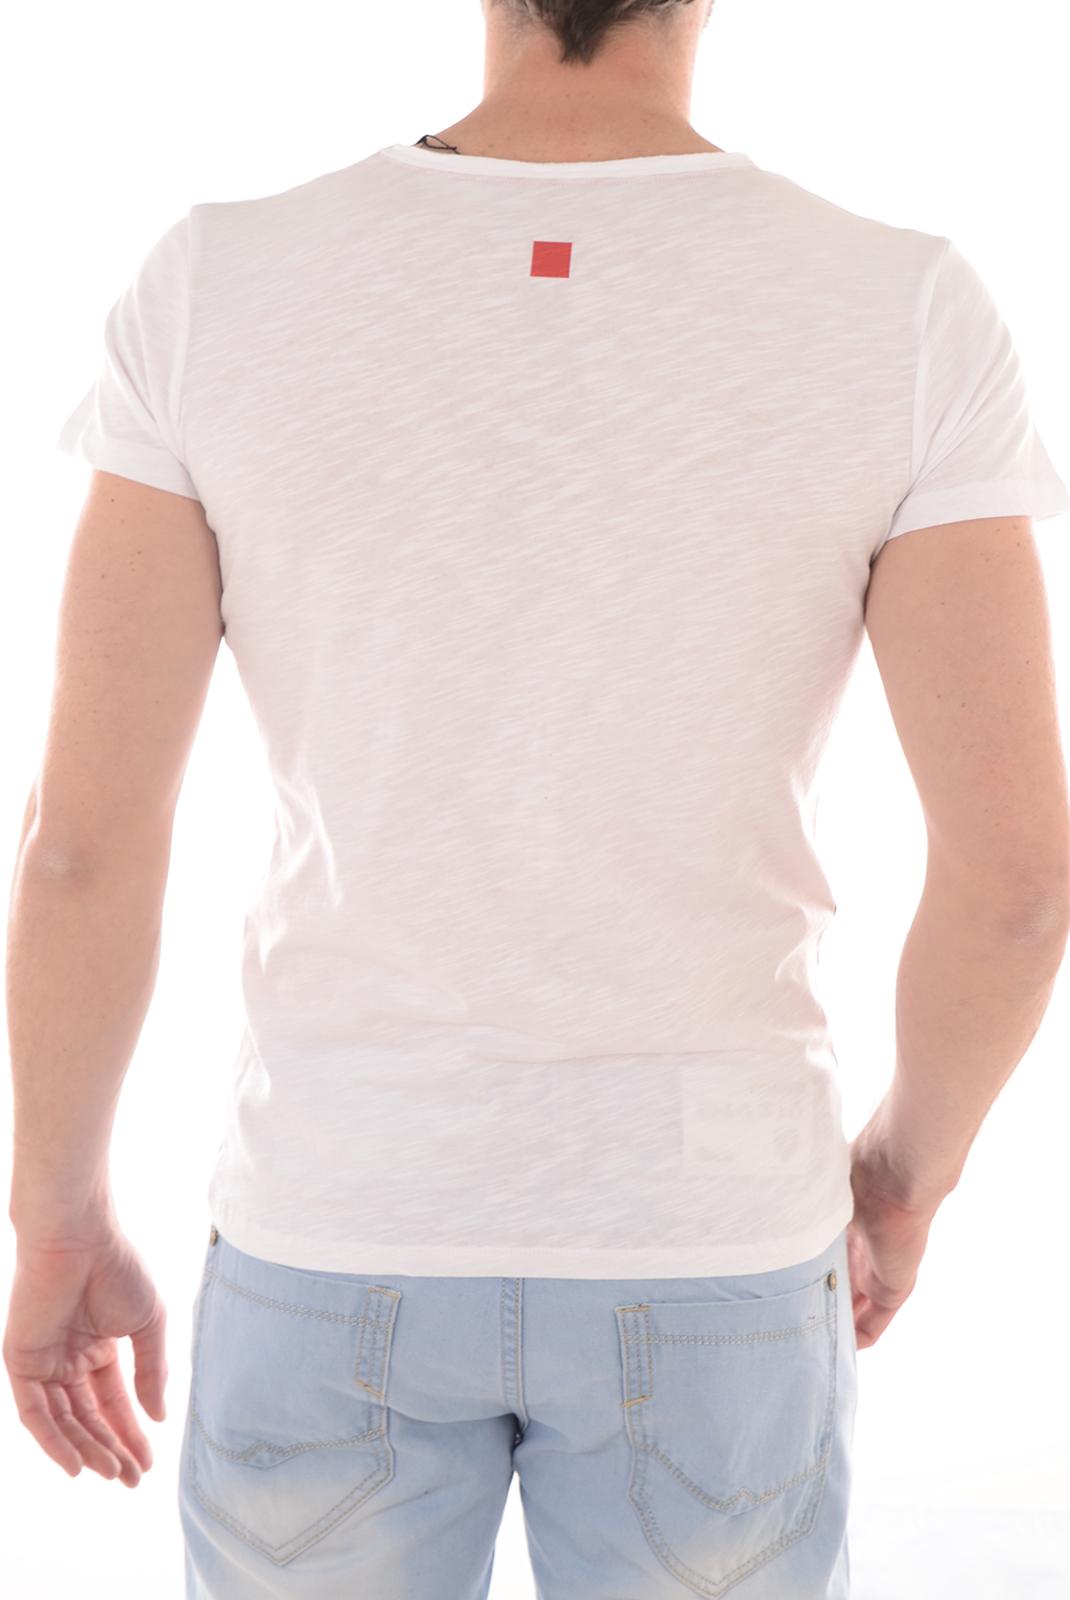 Tee-shirts  Manu hancock MOTOSURF COL V WHITE